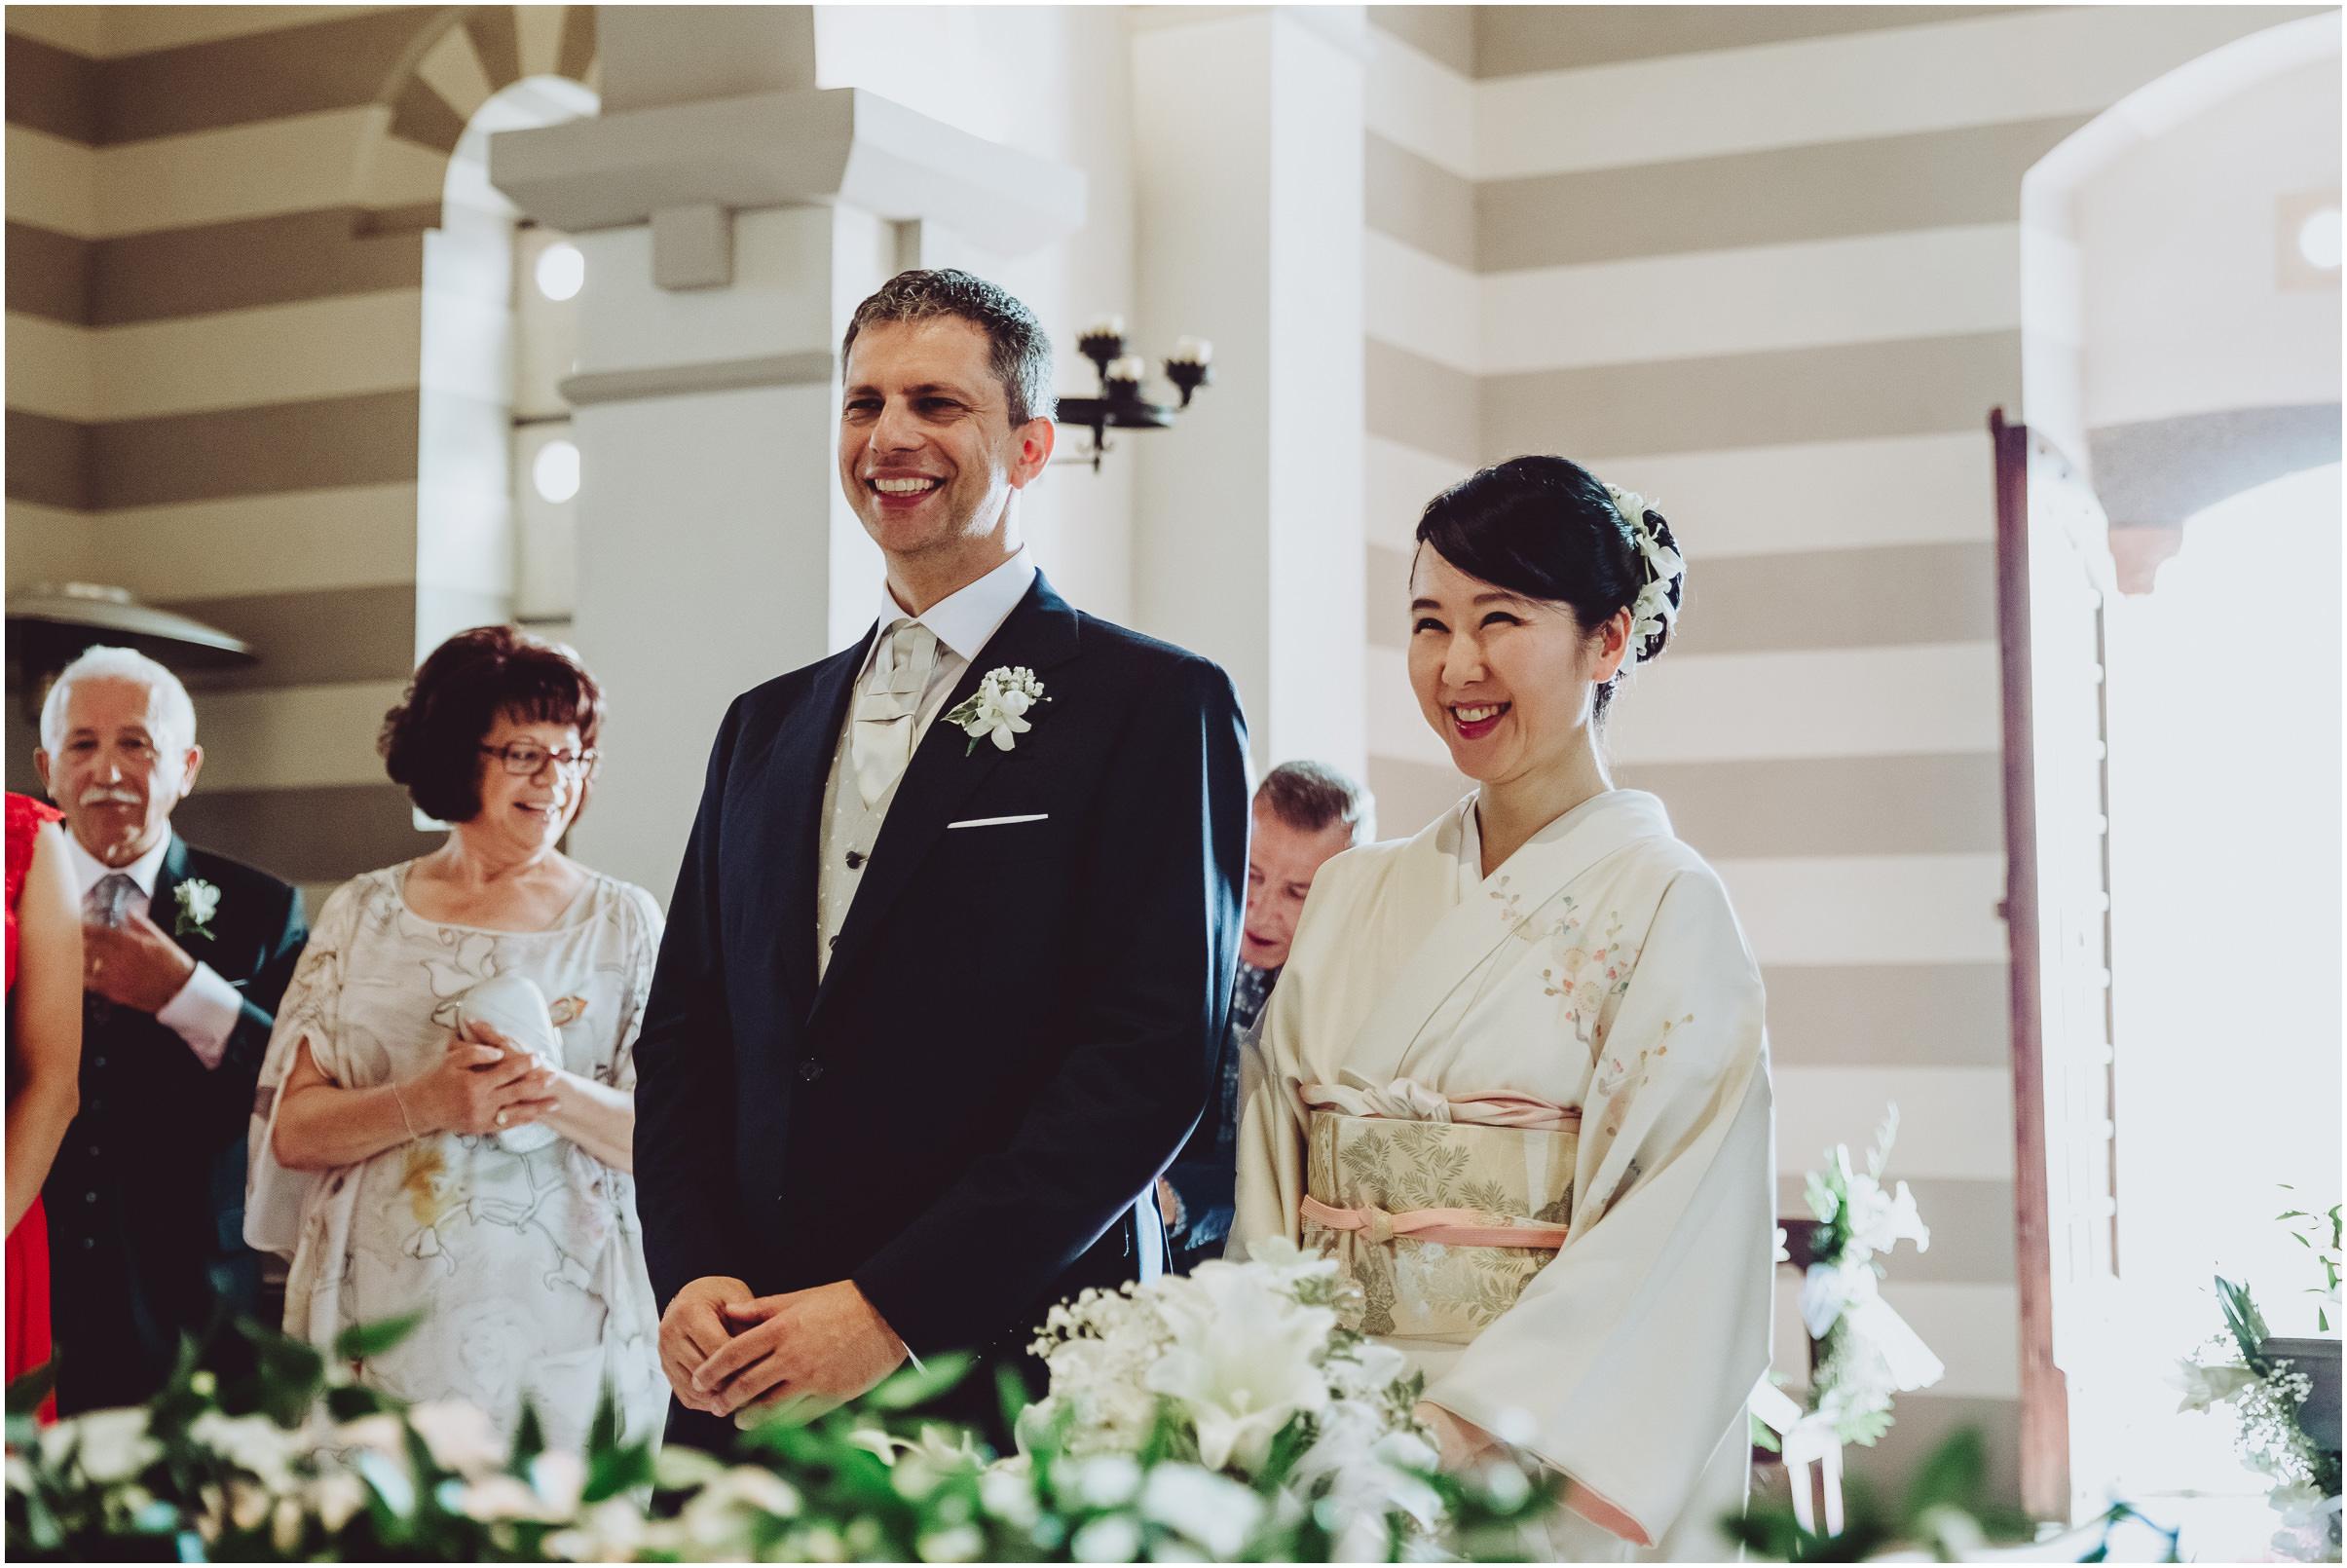 WEDDING-PHOTOGRAPHY-SARA-LORENZONI-FOTOGRAFIA-MATRIMONIO-ORVIETO-JUKA-ANTONELLO09